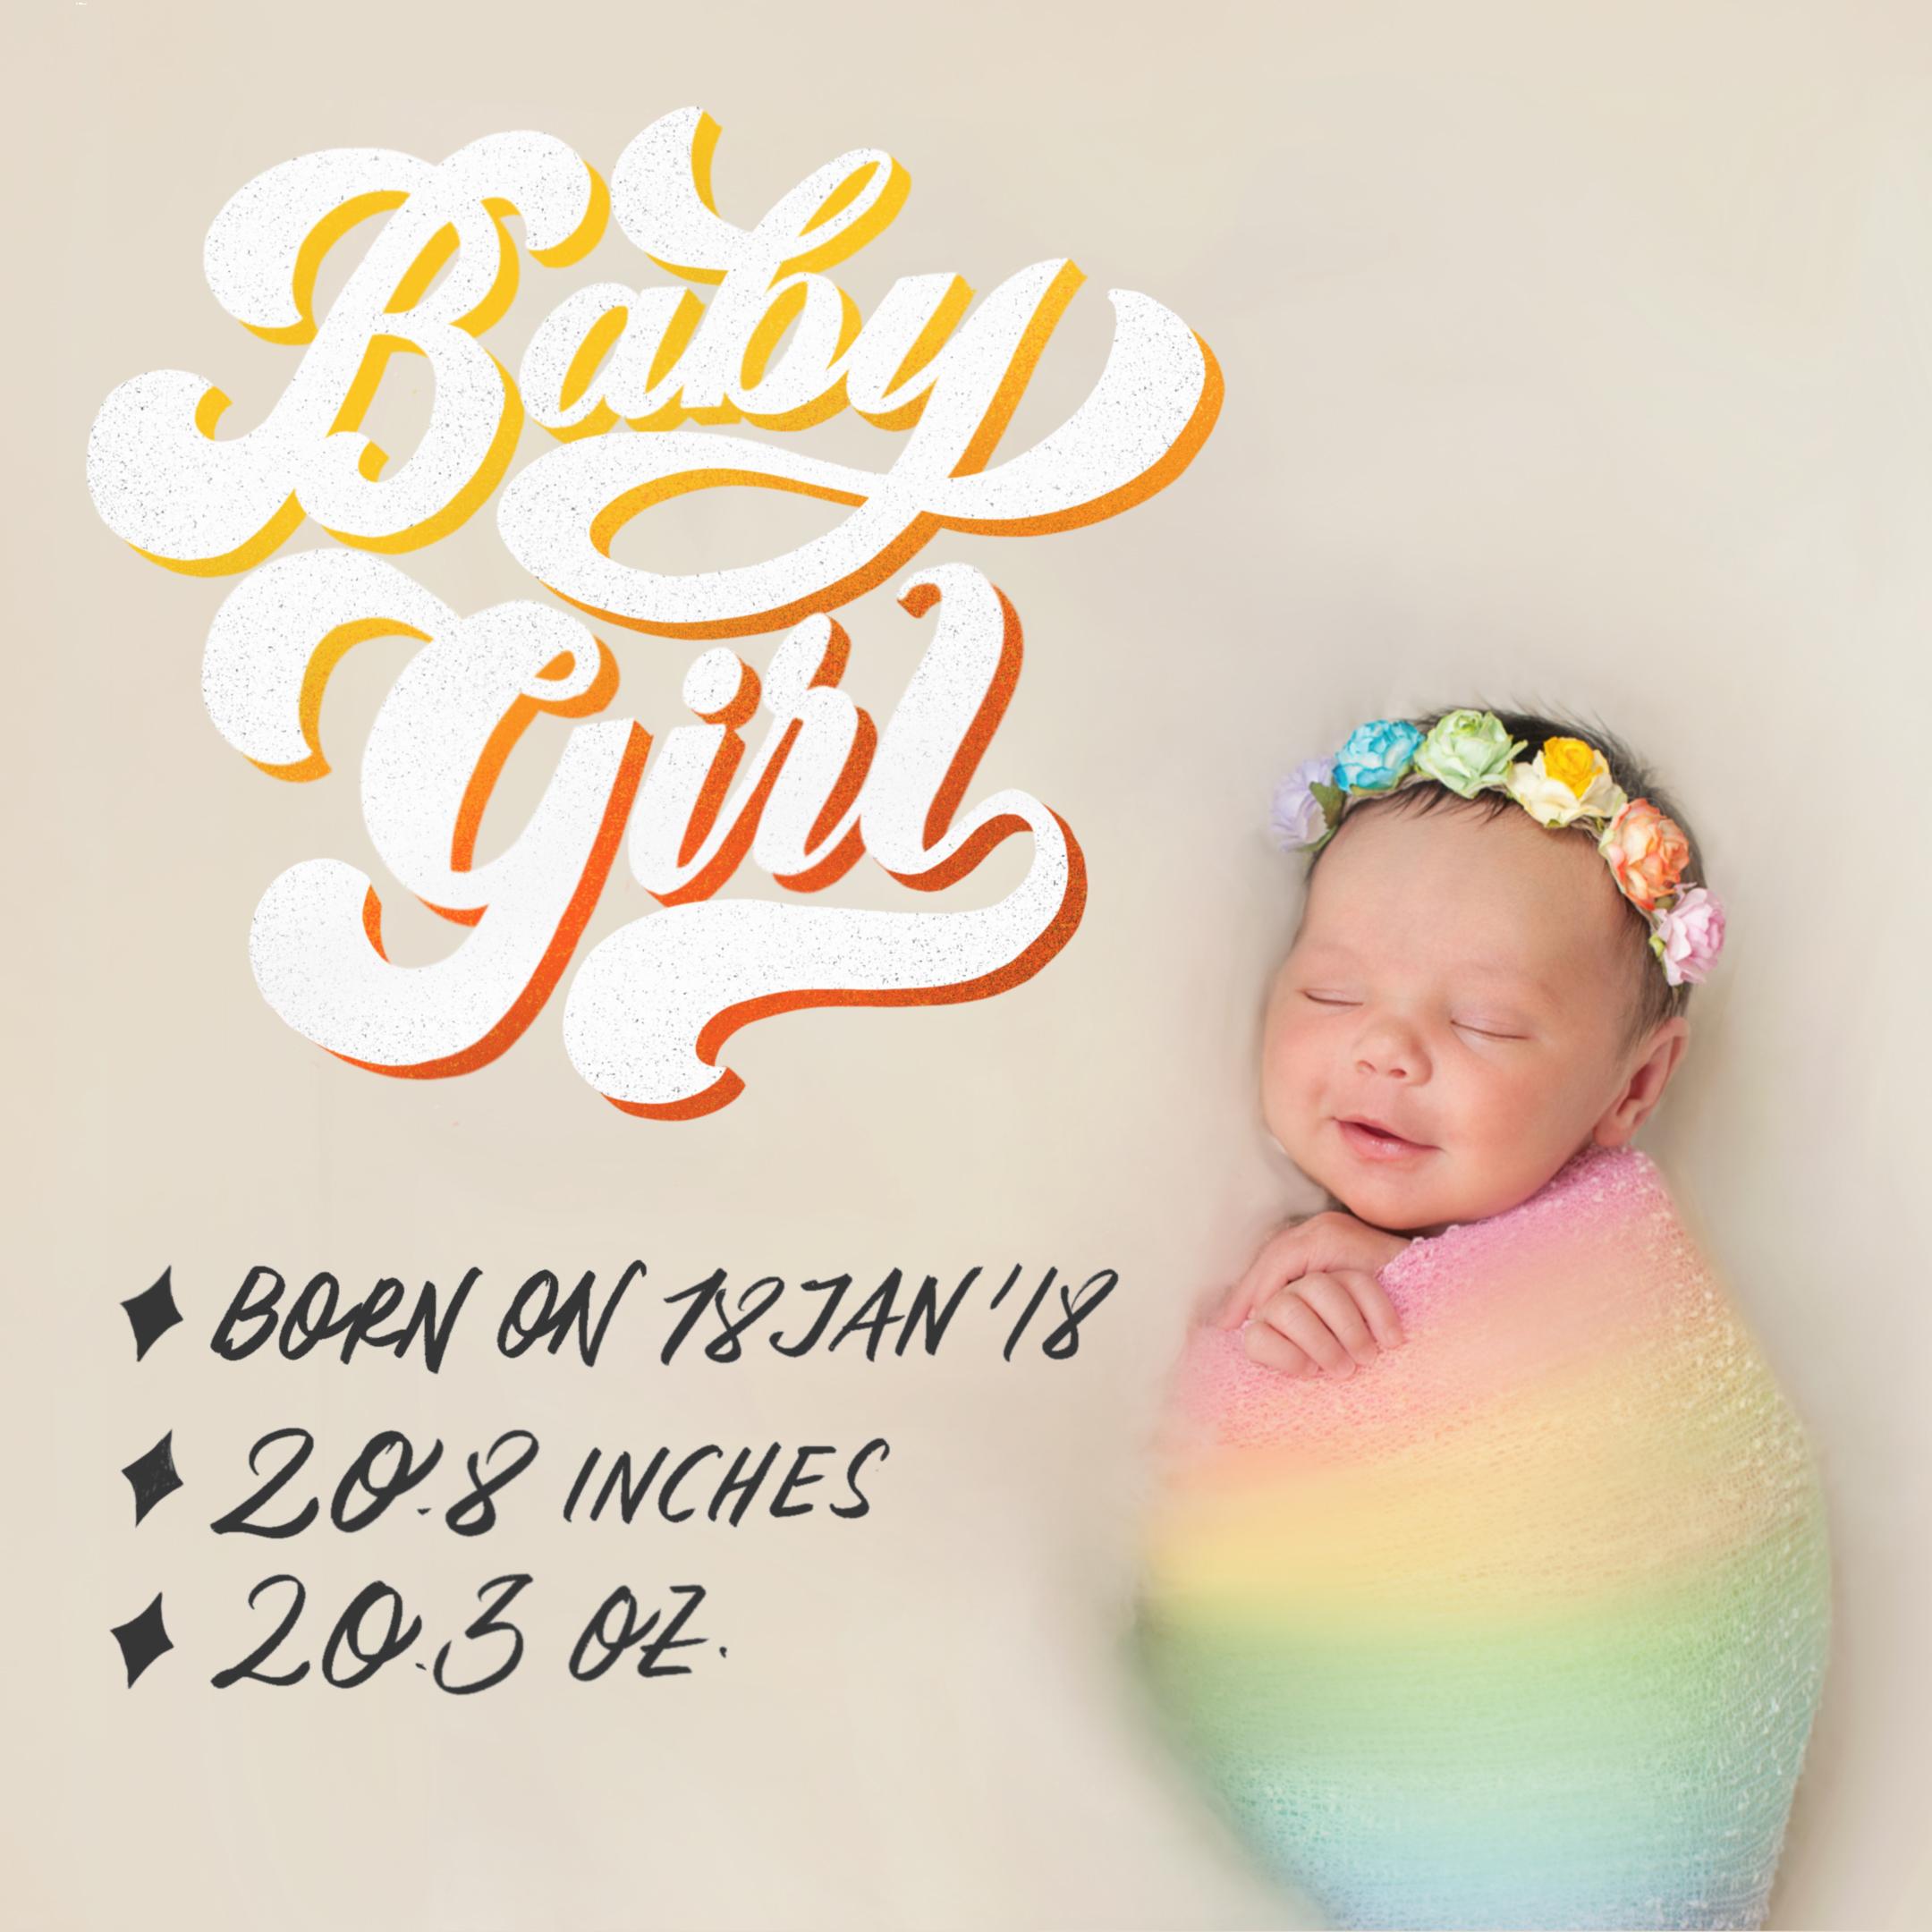 Baby-Girl-(2160px-x-2160px).jpg